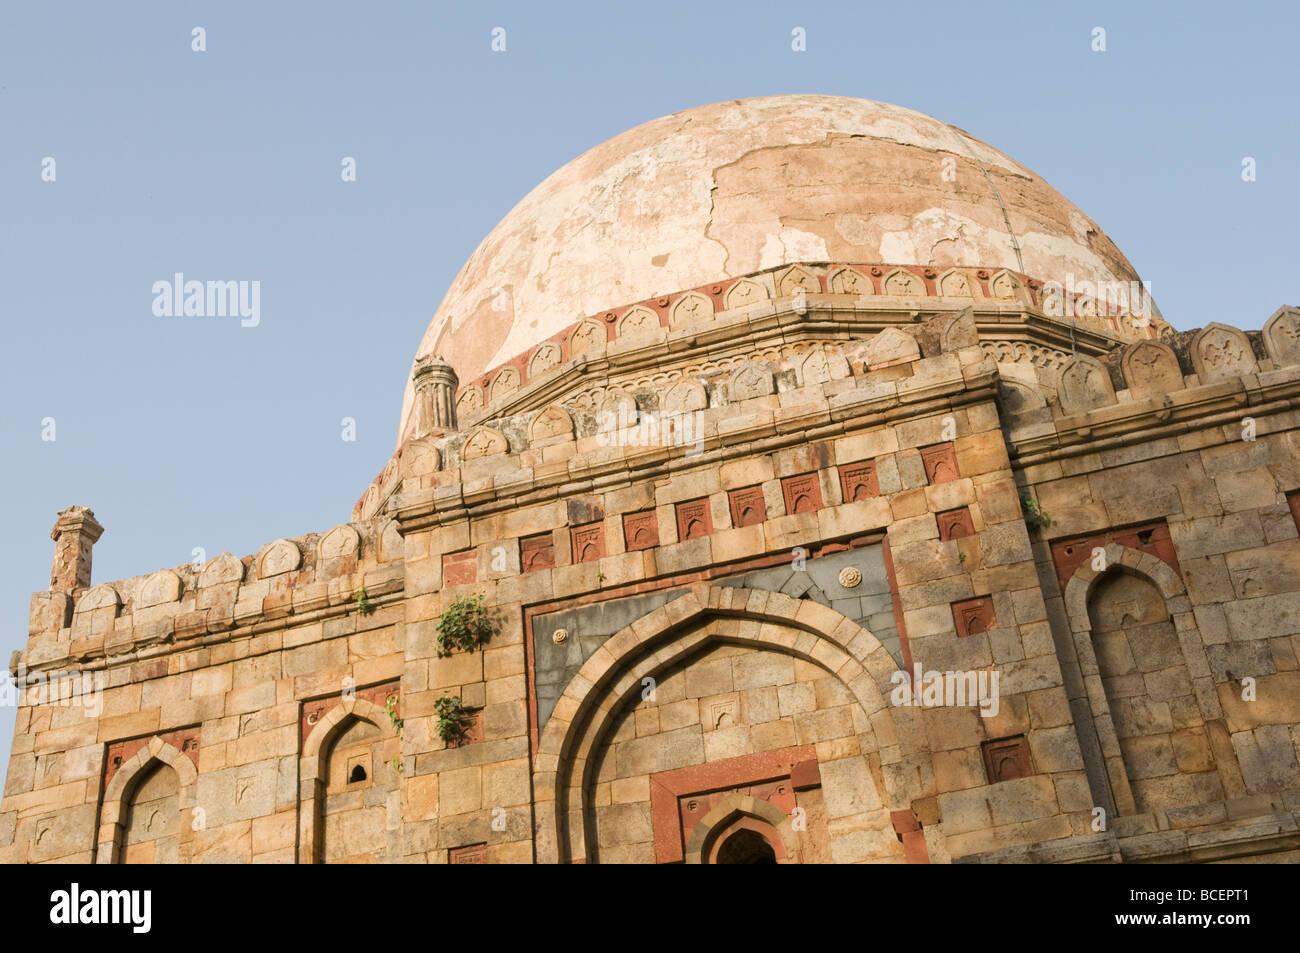 A tomb in Lodi Garden New Delhi India - Stock Image